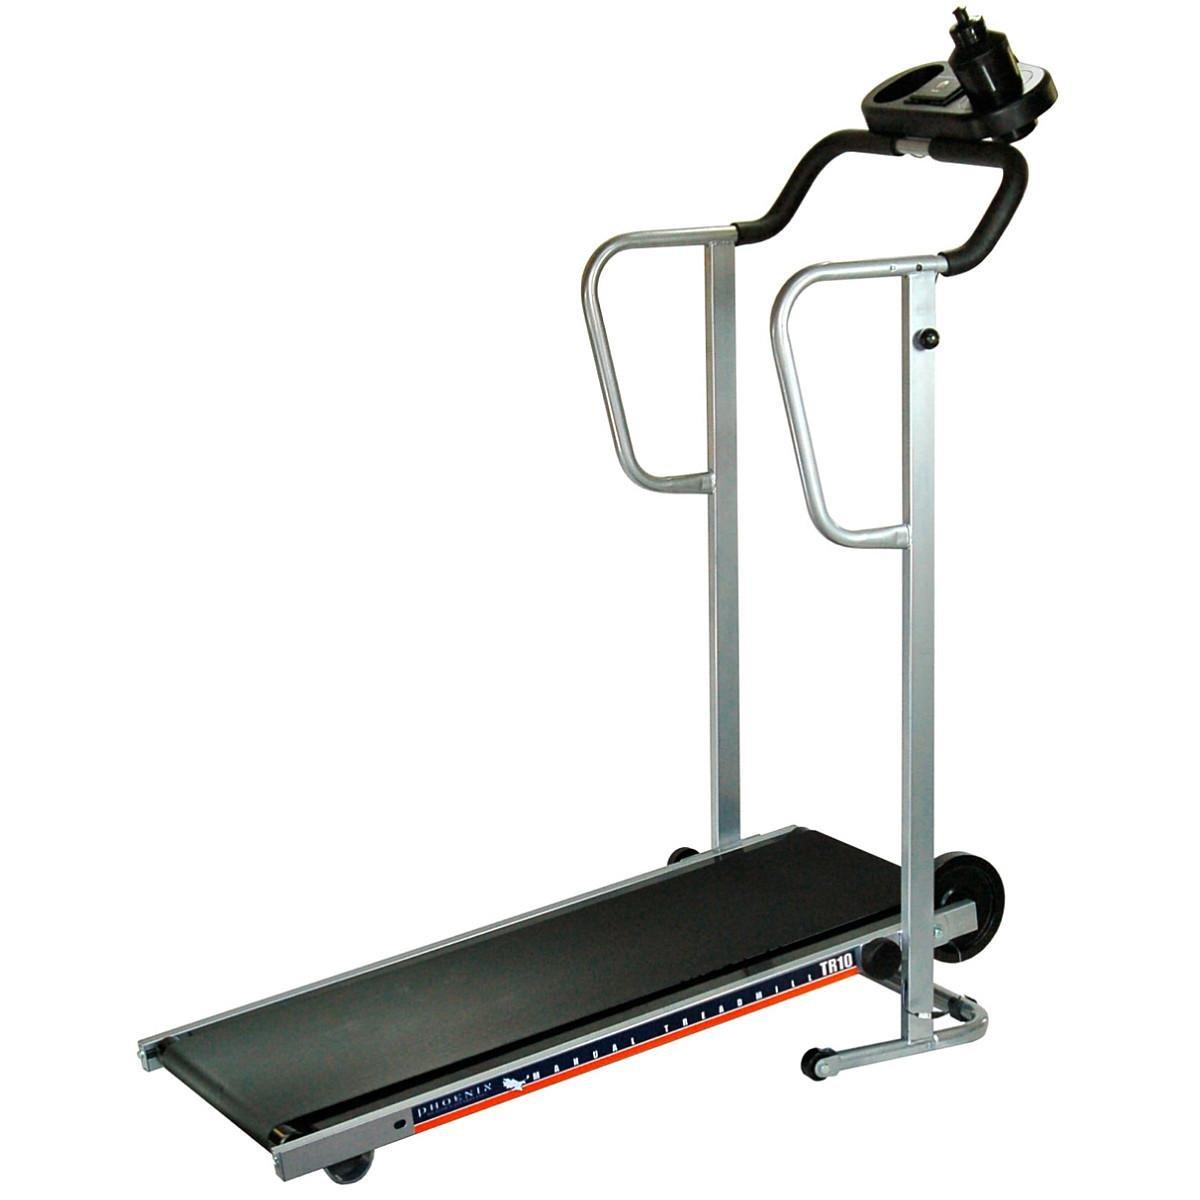 Phoenix 98510 Easy-Up Manual Treadmill by PHOENIX VITAL LIFE (Image #1)